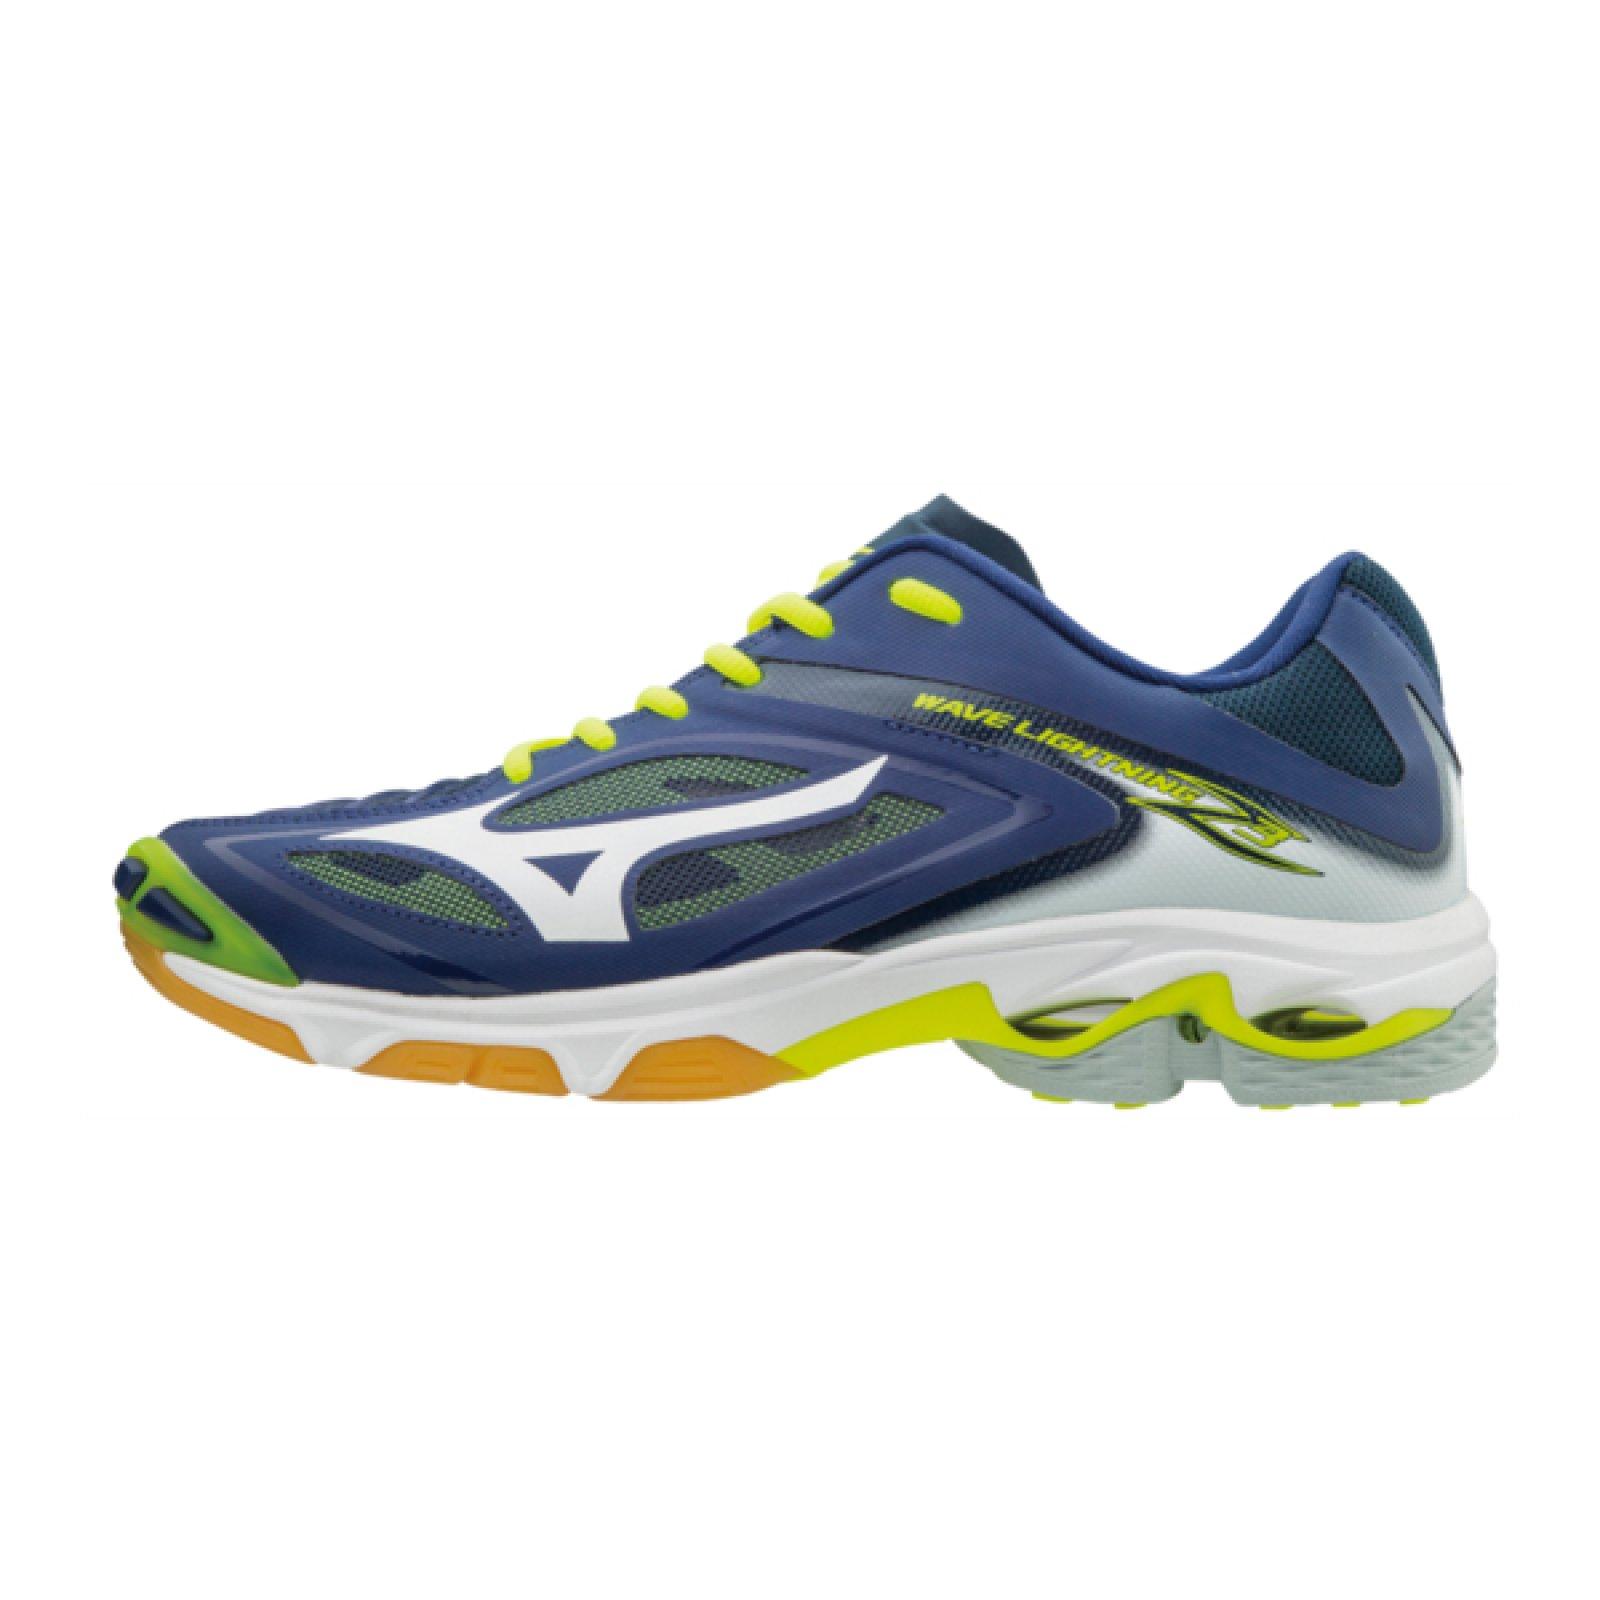 93bba2f2513d6 Volejbalové boty Mizuno Wave Lightning Z3 V1GA170071 - Actisport.cz